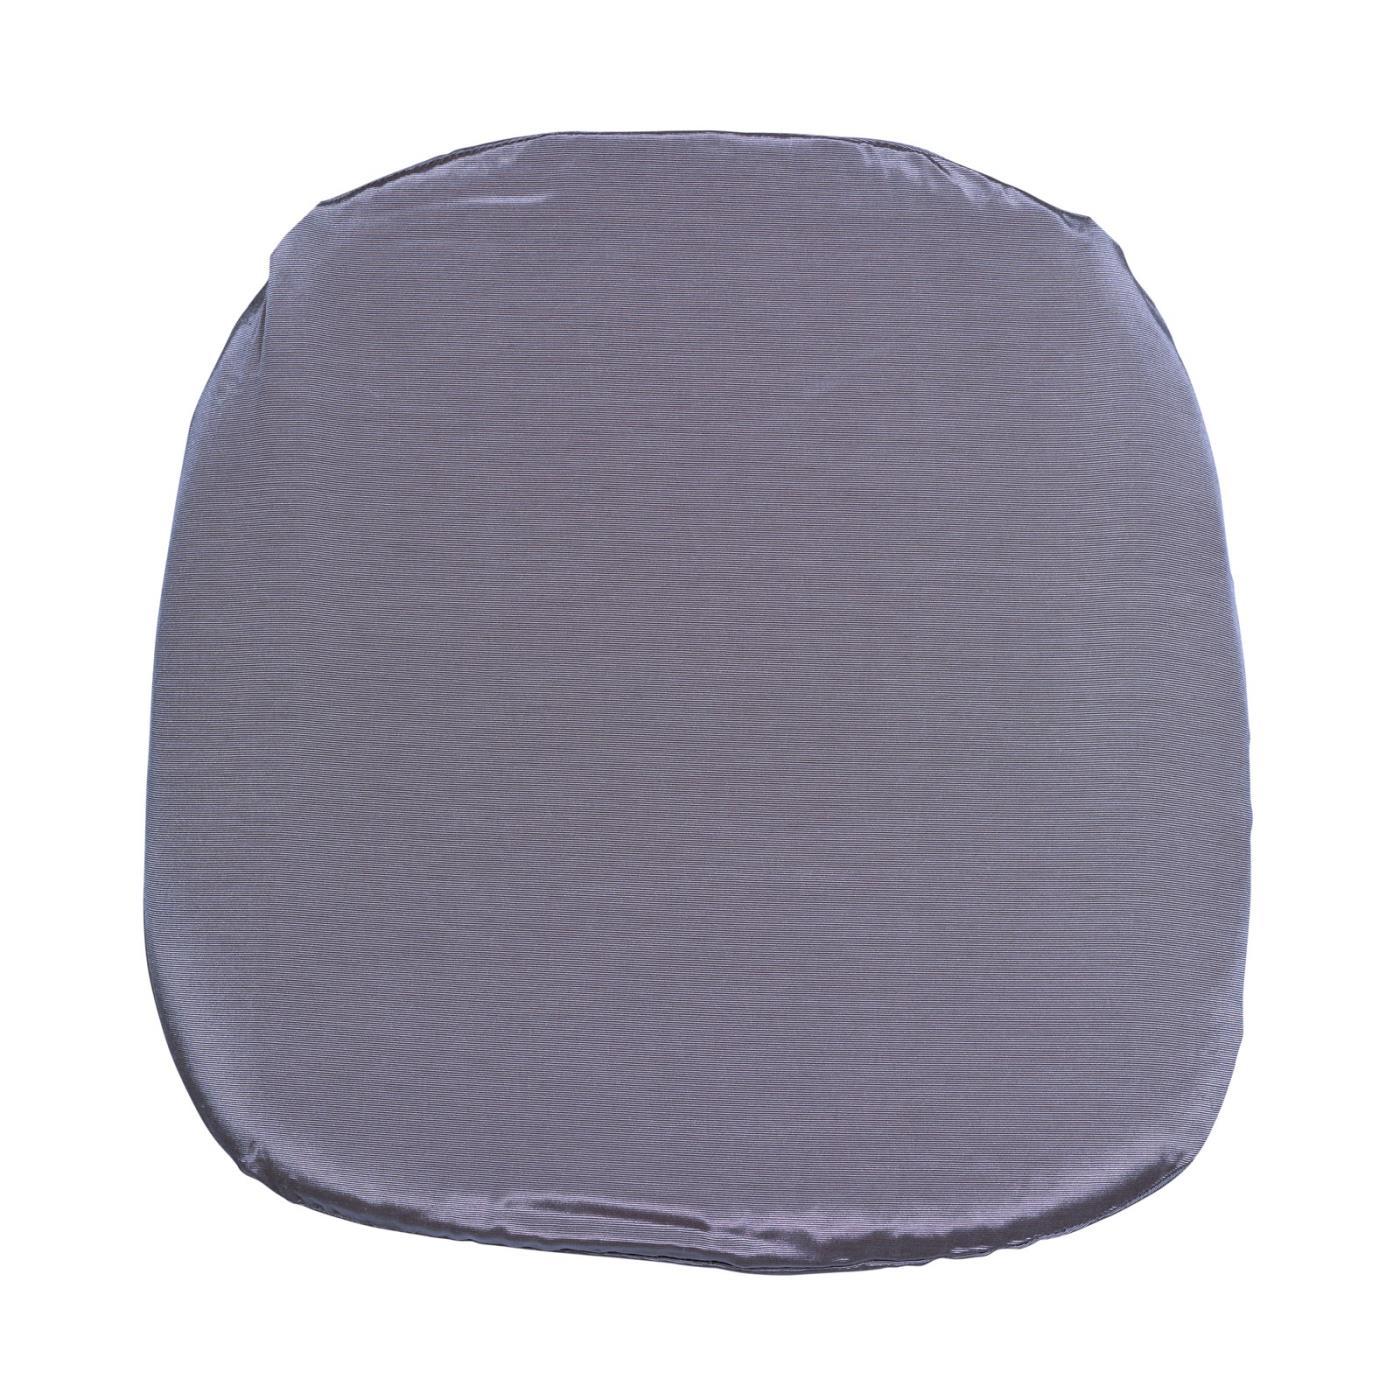 Bengaline Seat Cushion - Silver